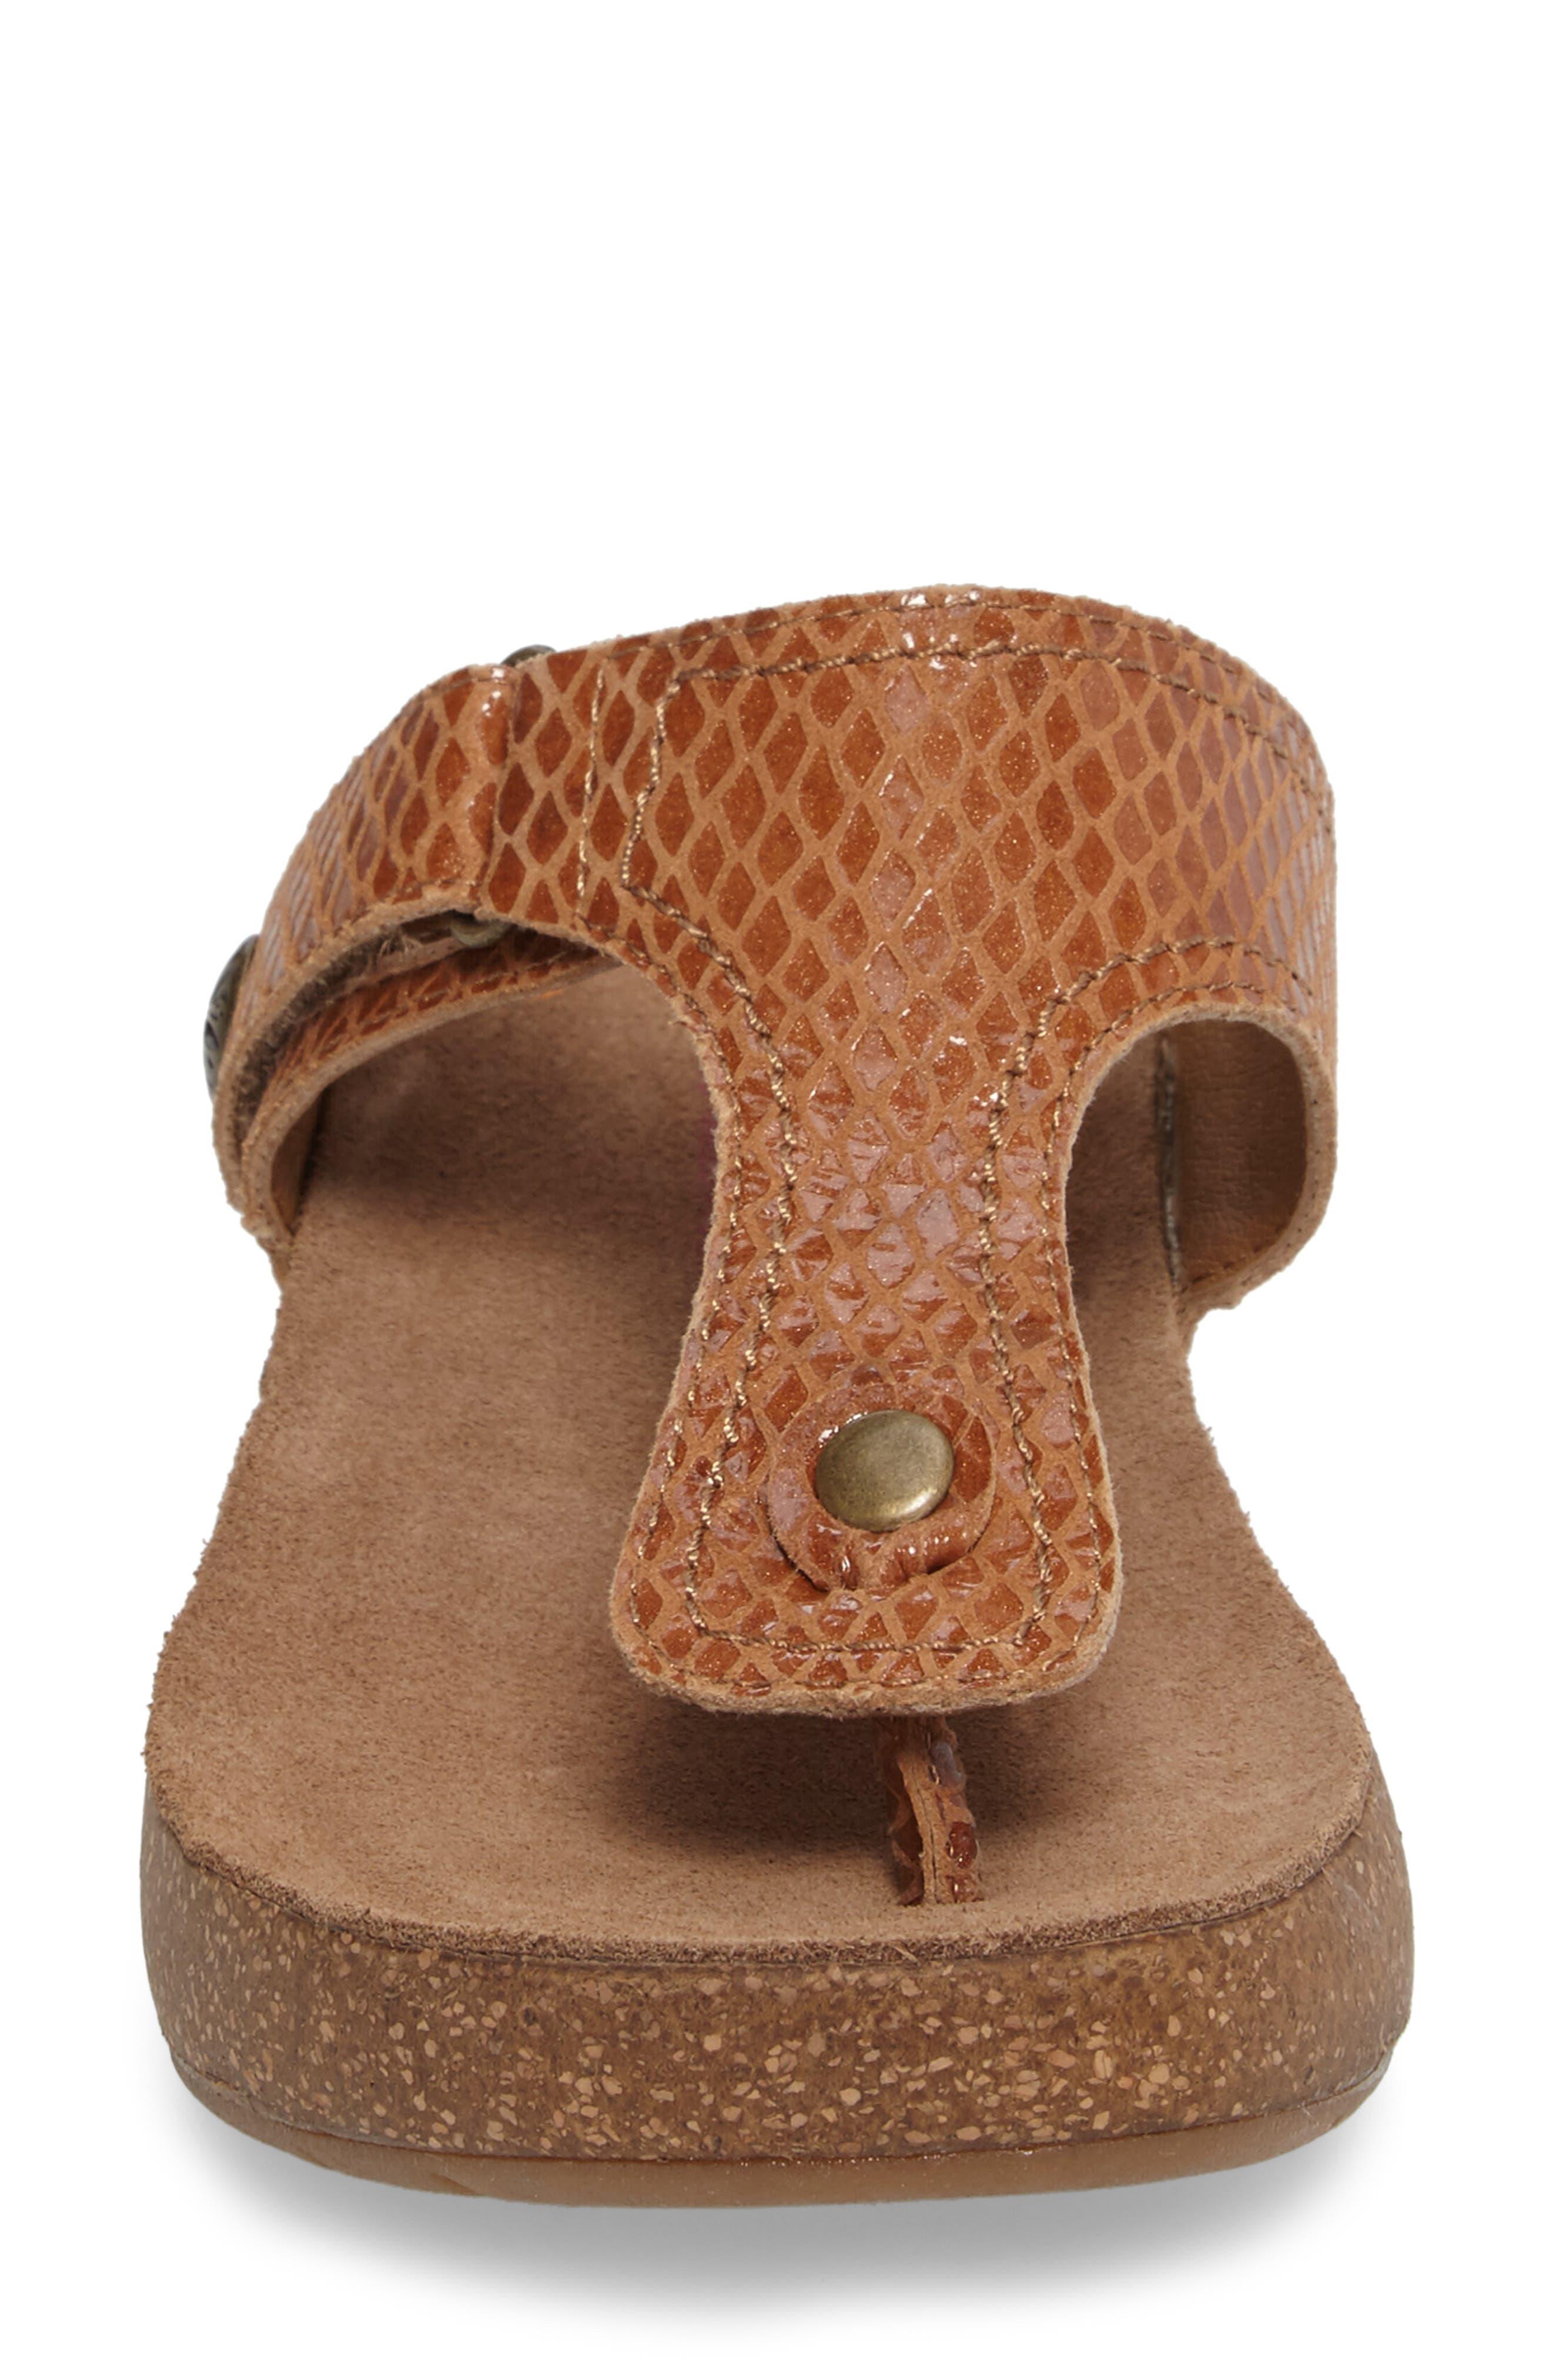 Shantel Flip Flop,                             Alternate thumbnail 4, color,                             Luggage Print Leather